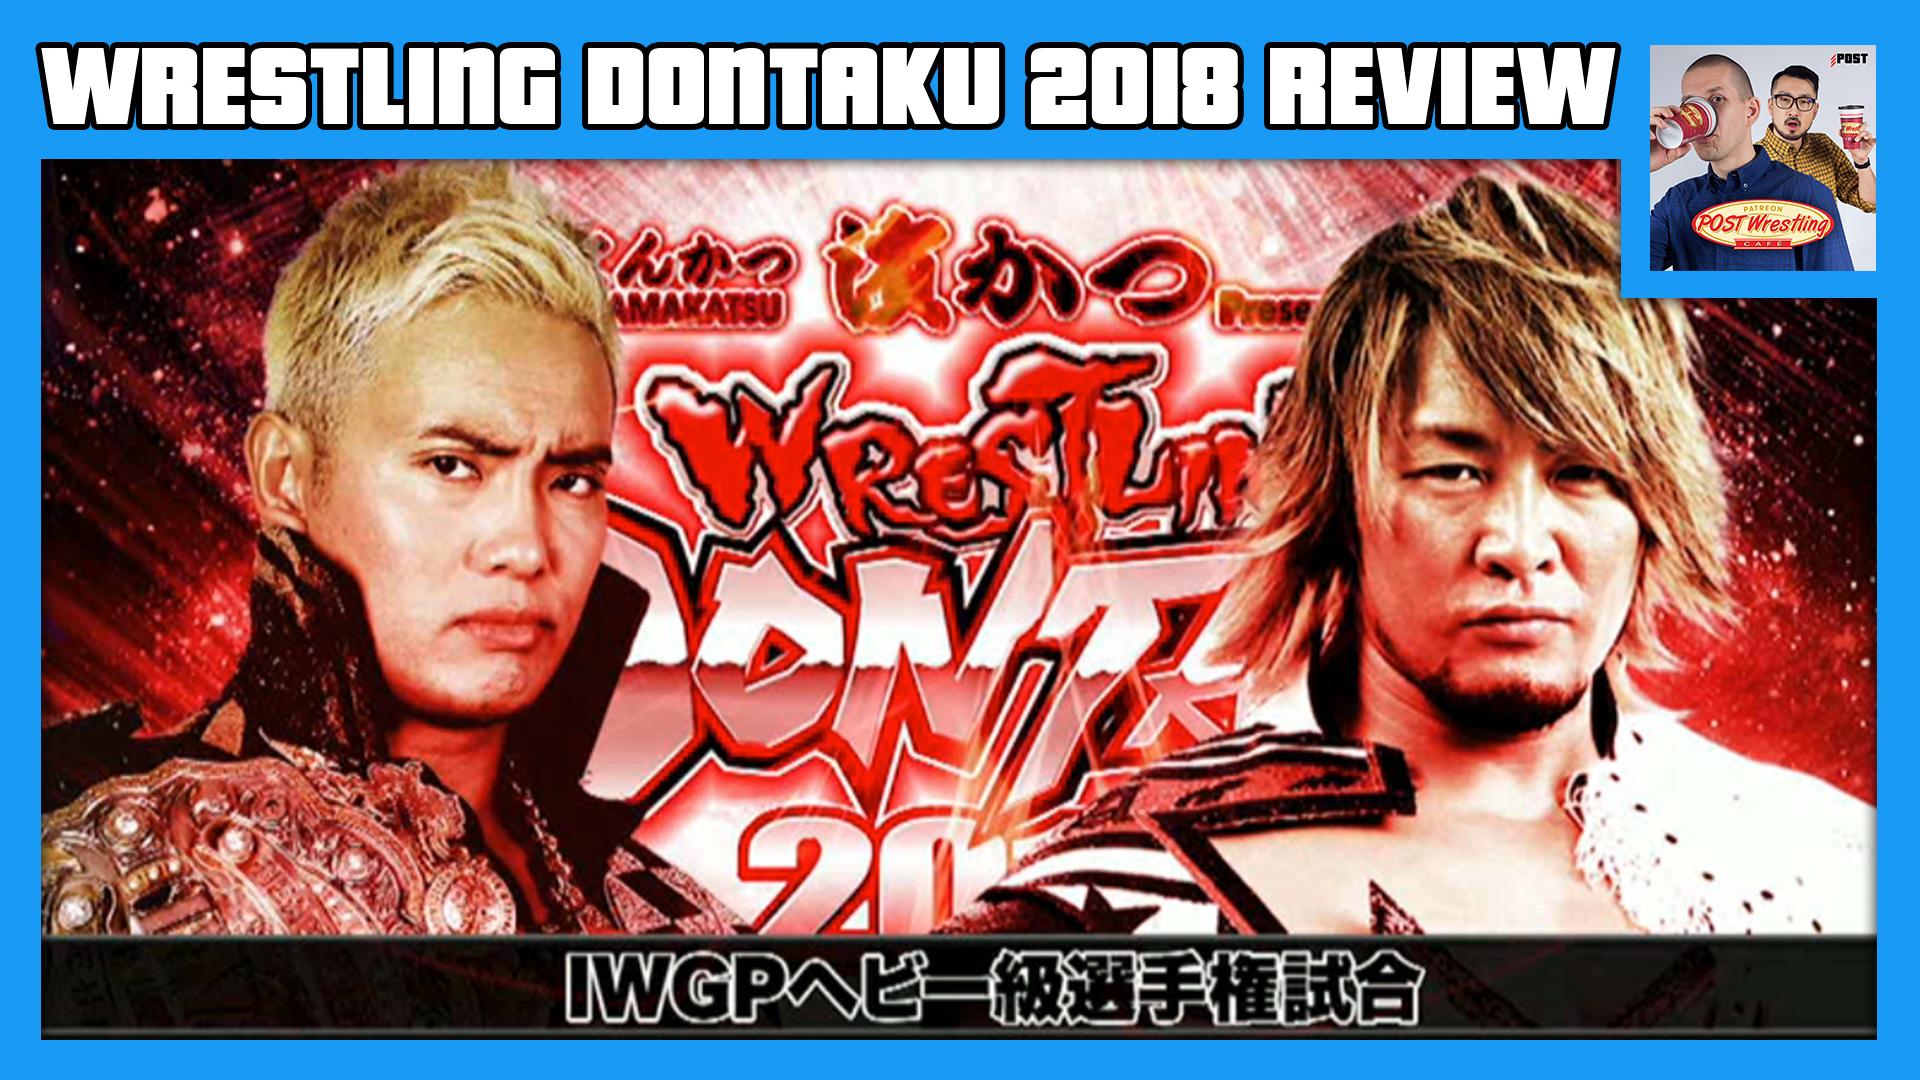 Njpw Dontaku 2018 Reviews Post Wrestling Wwe Nxt Njpw